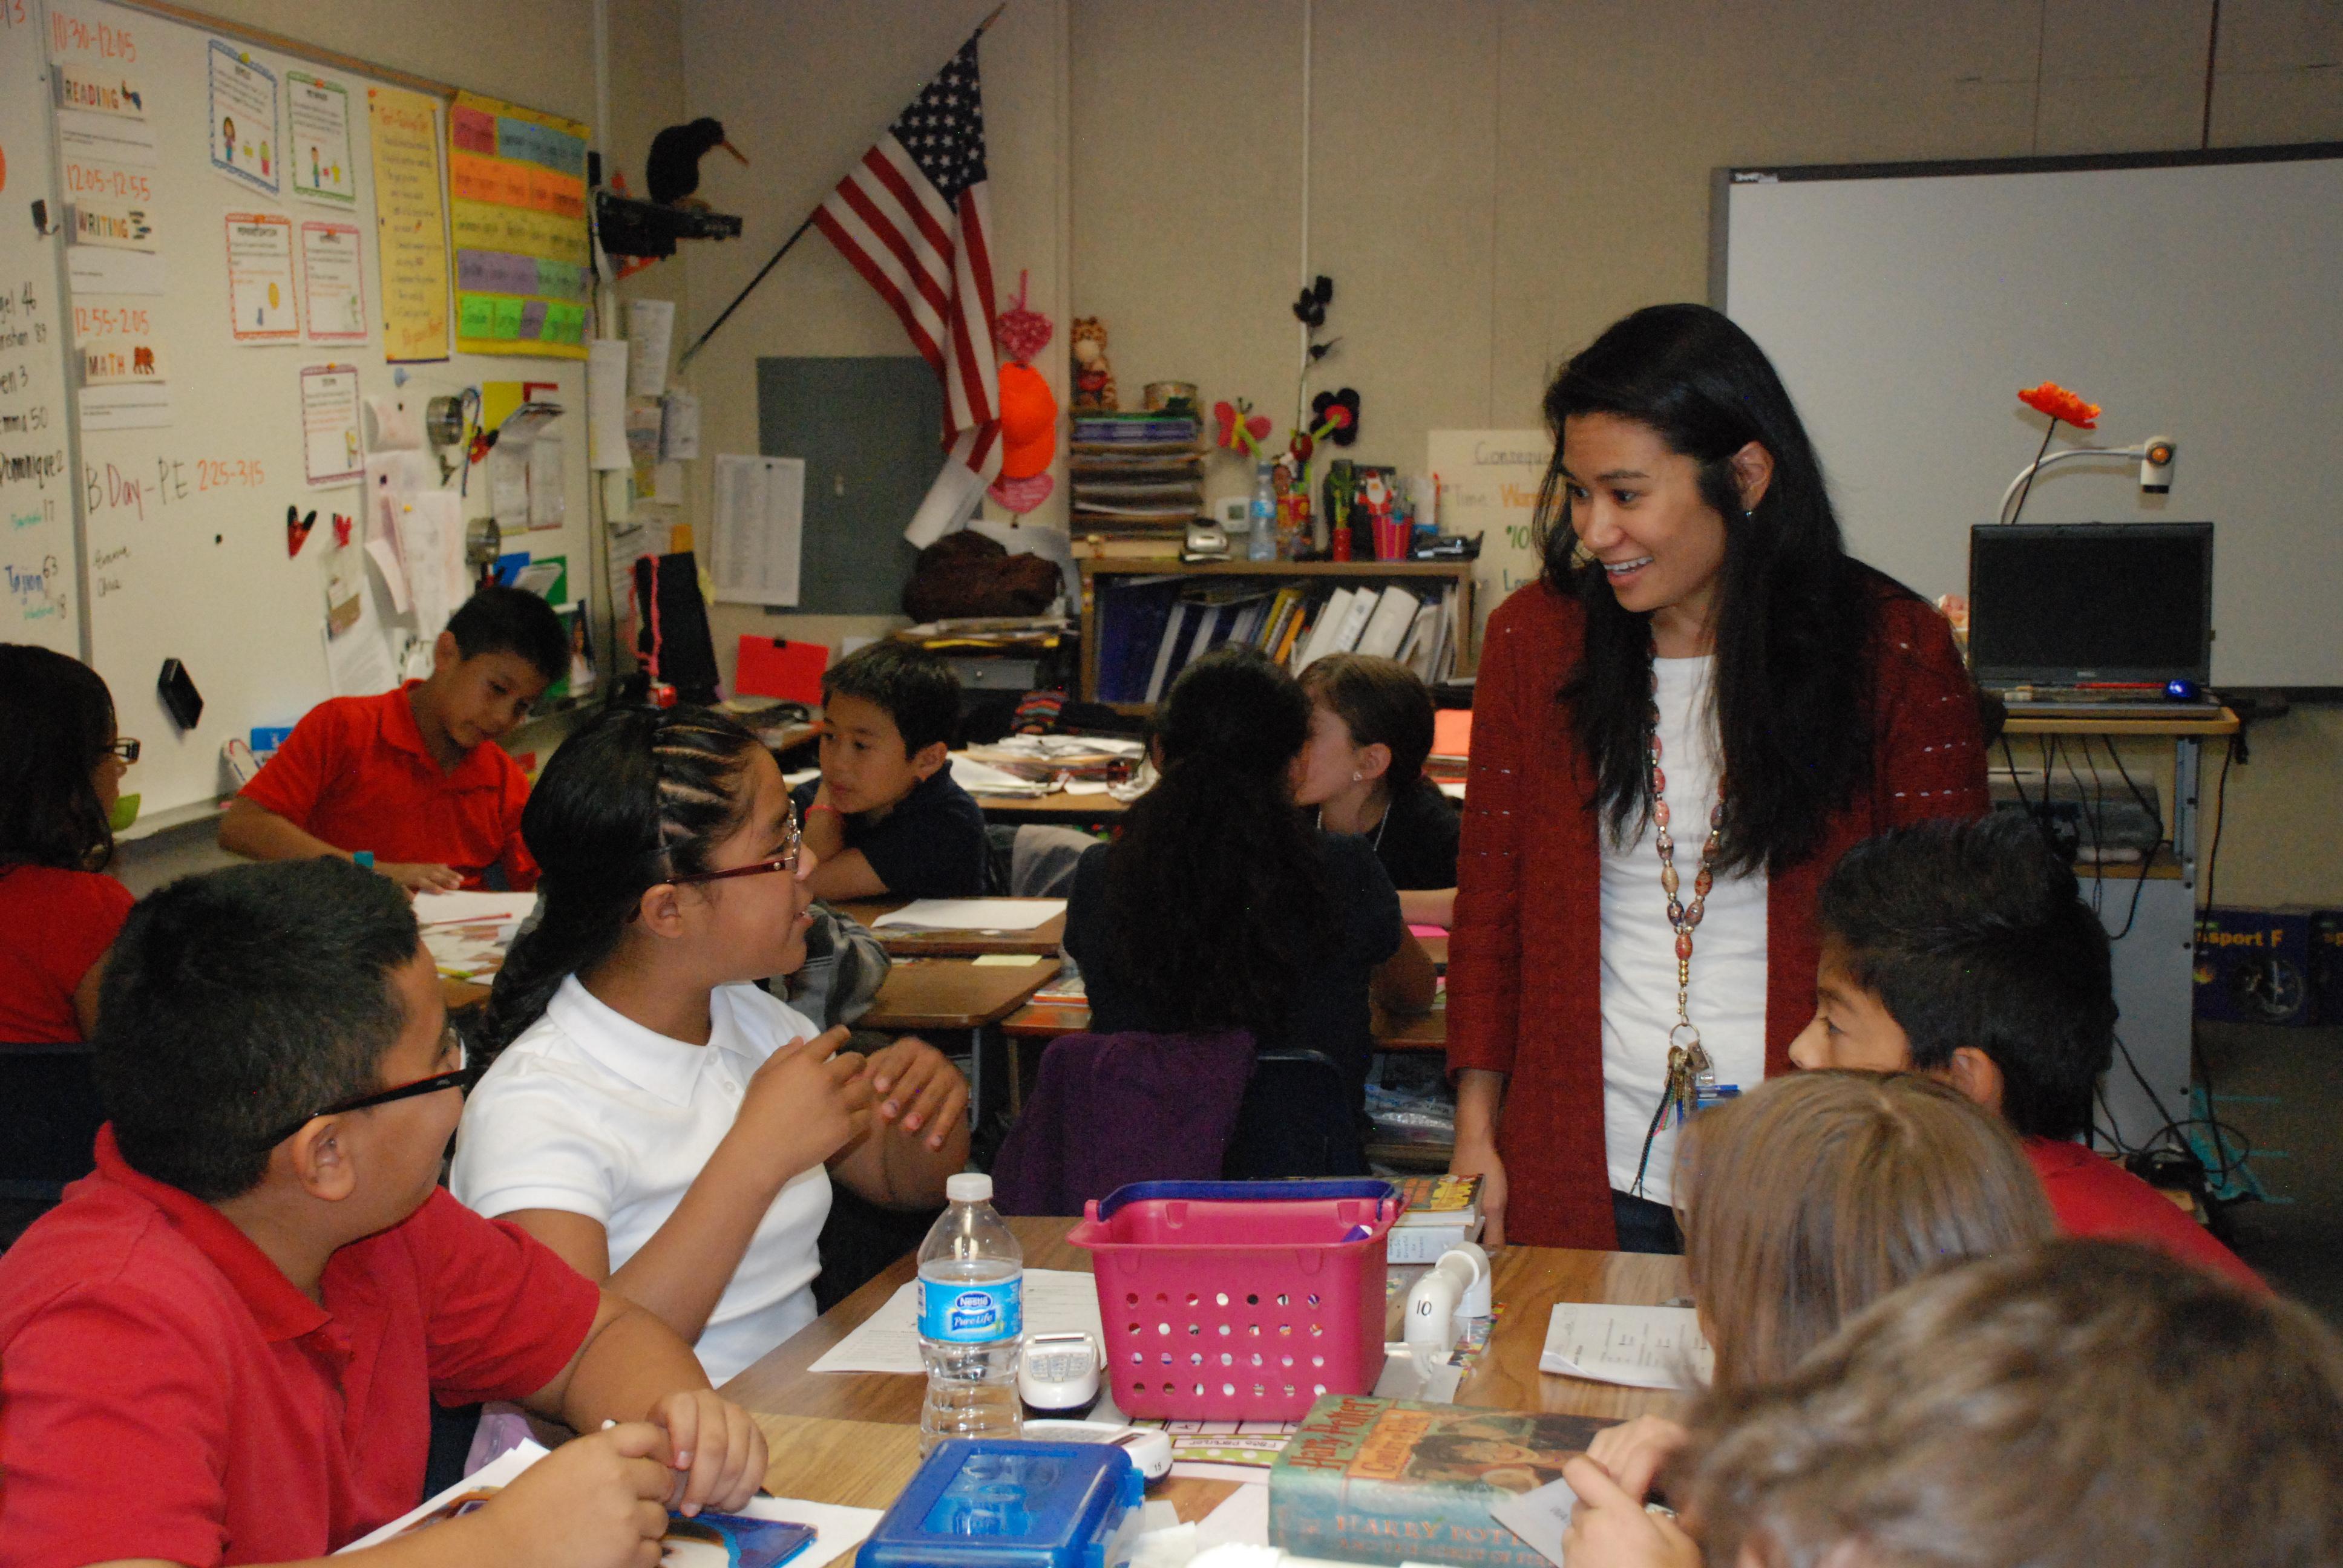 5th grade teacher Billie Ann Watanabe